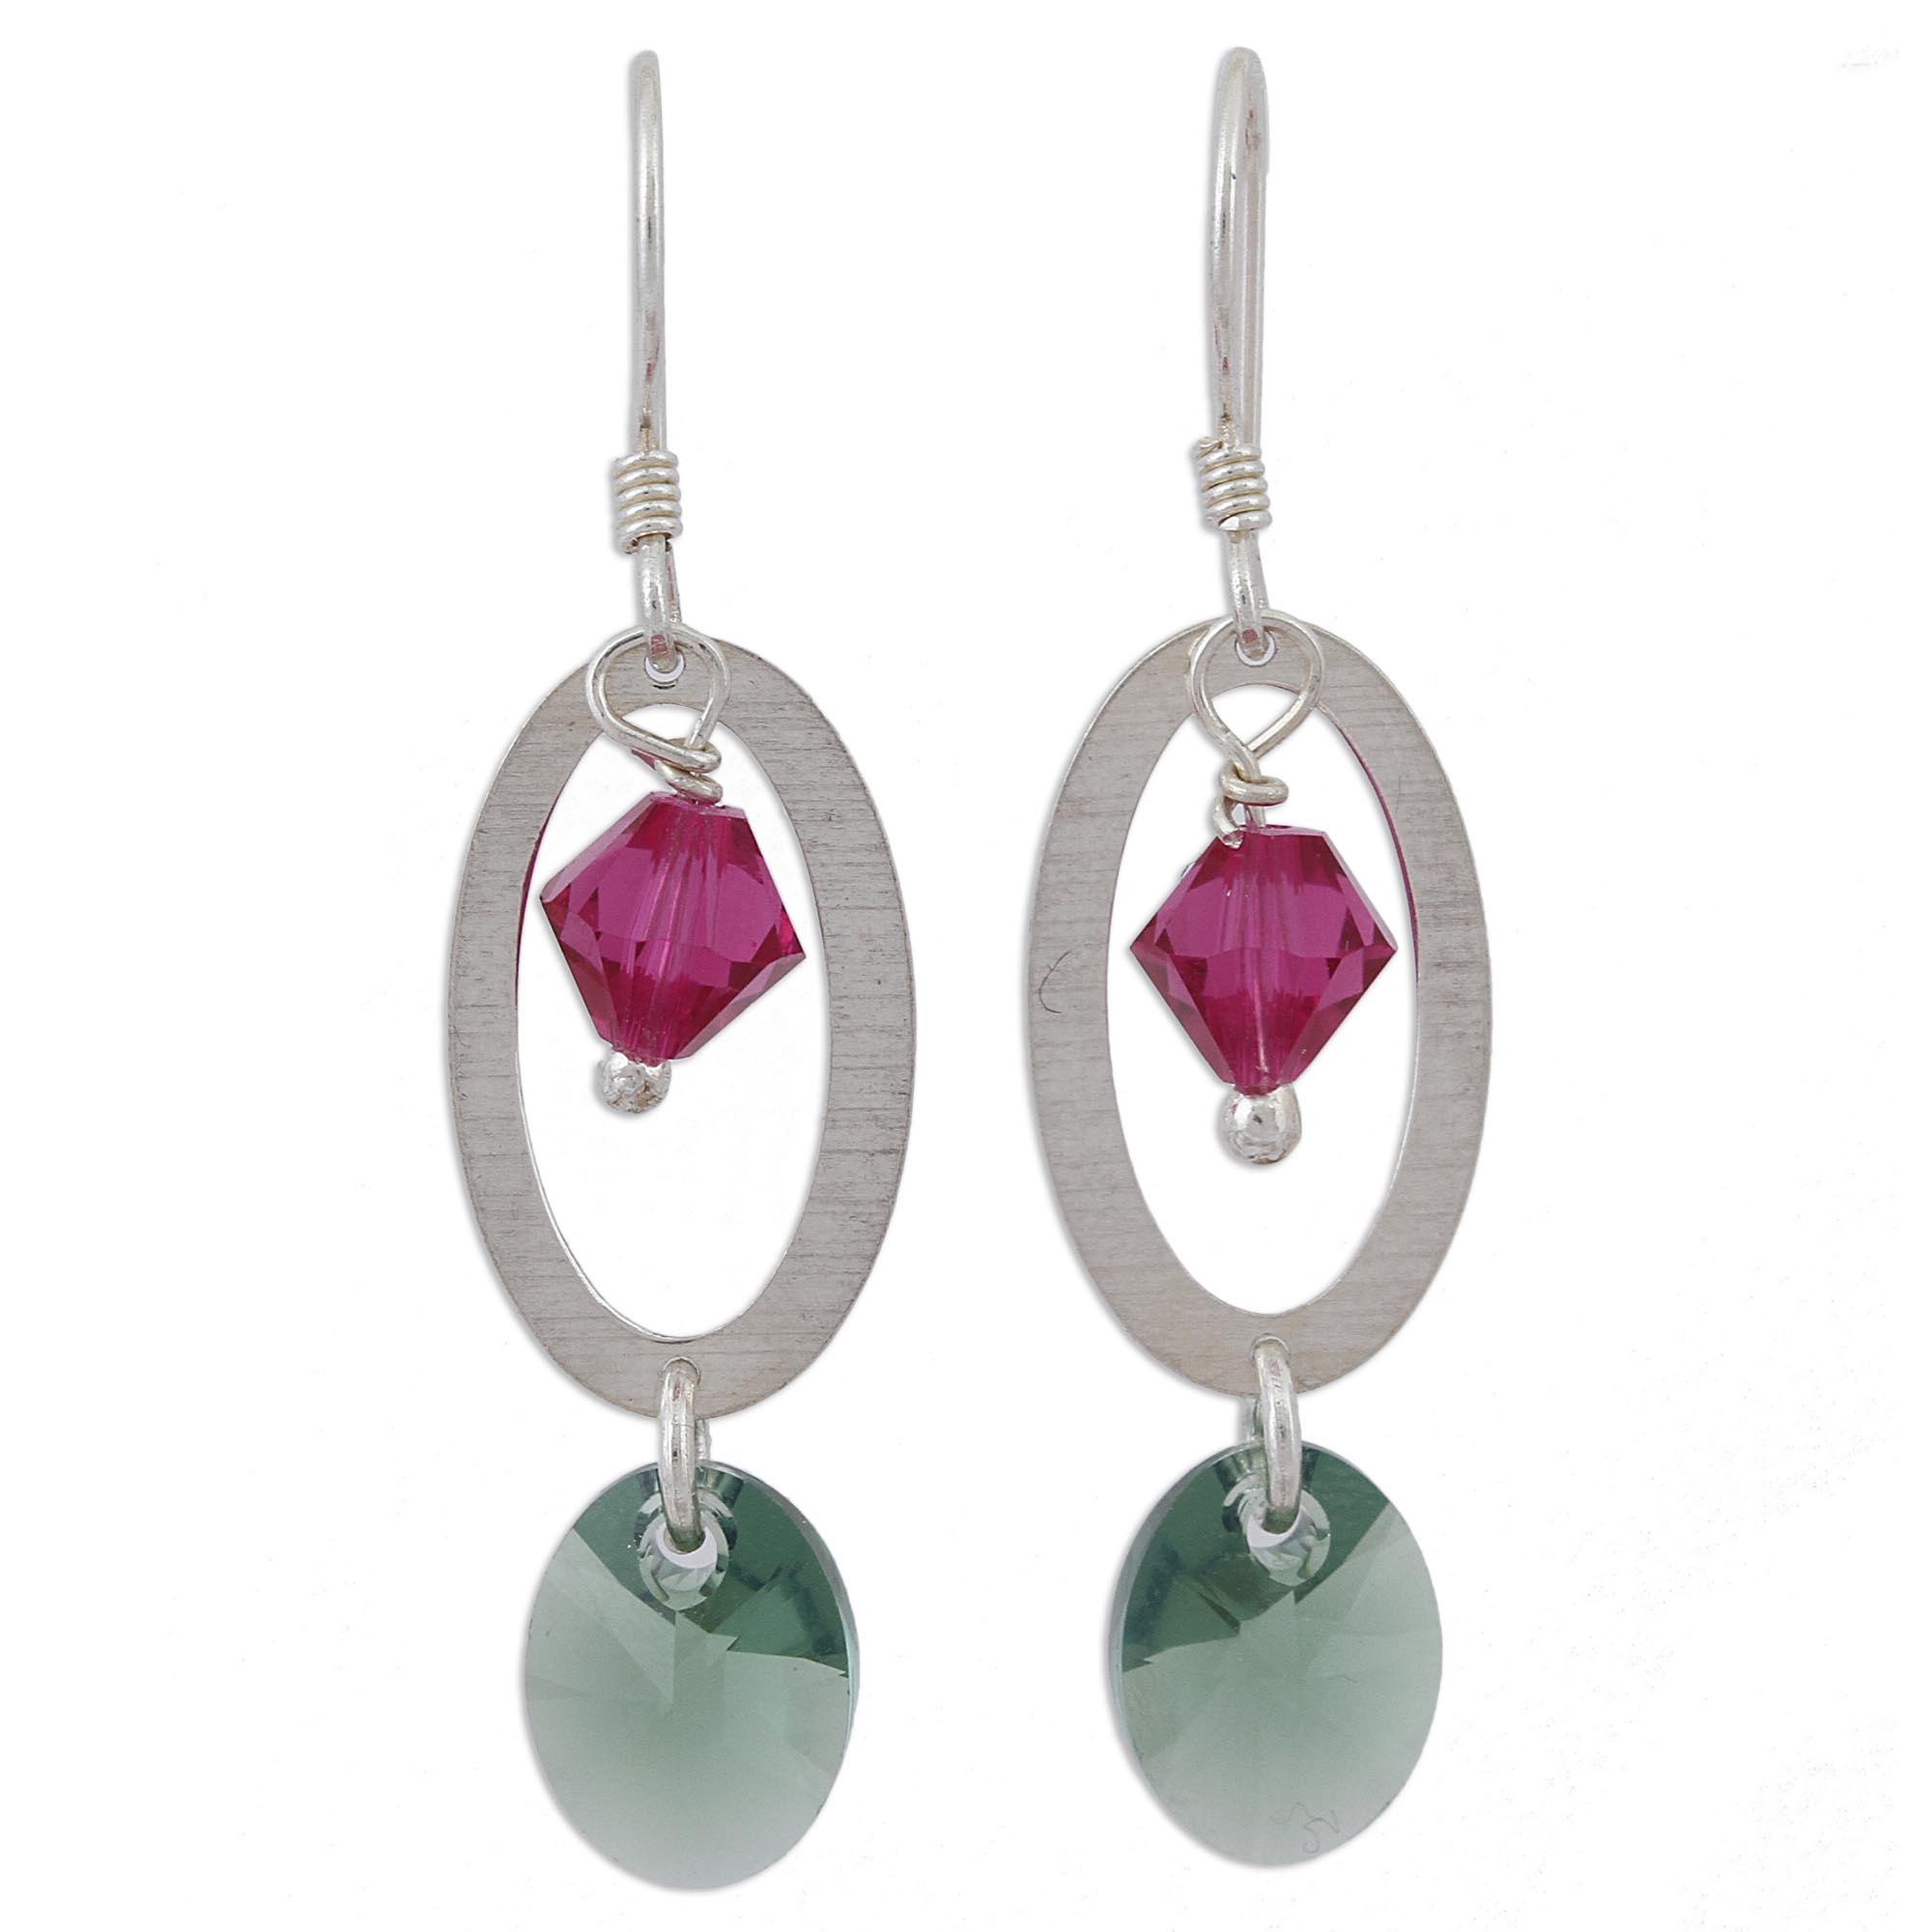 8352b5cb5f3a5 Swarovski Pink Crystal Dangle Earrings - Best All Earring Photos ...